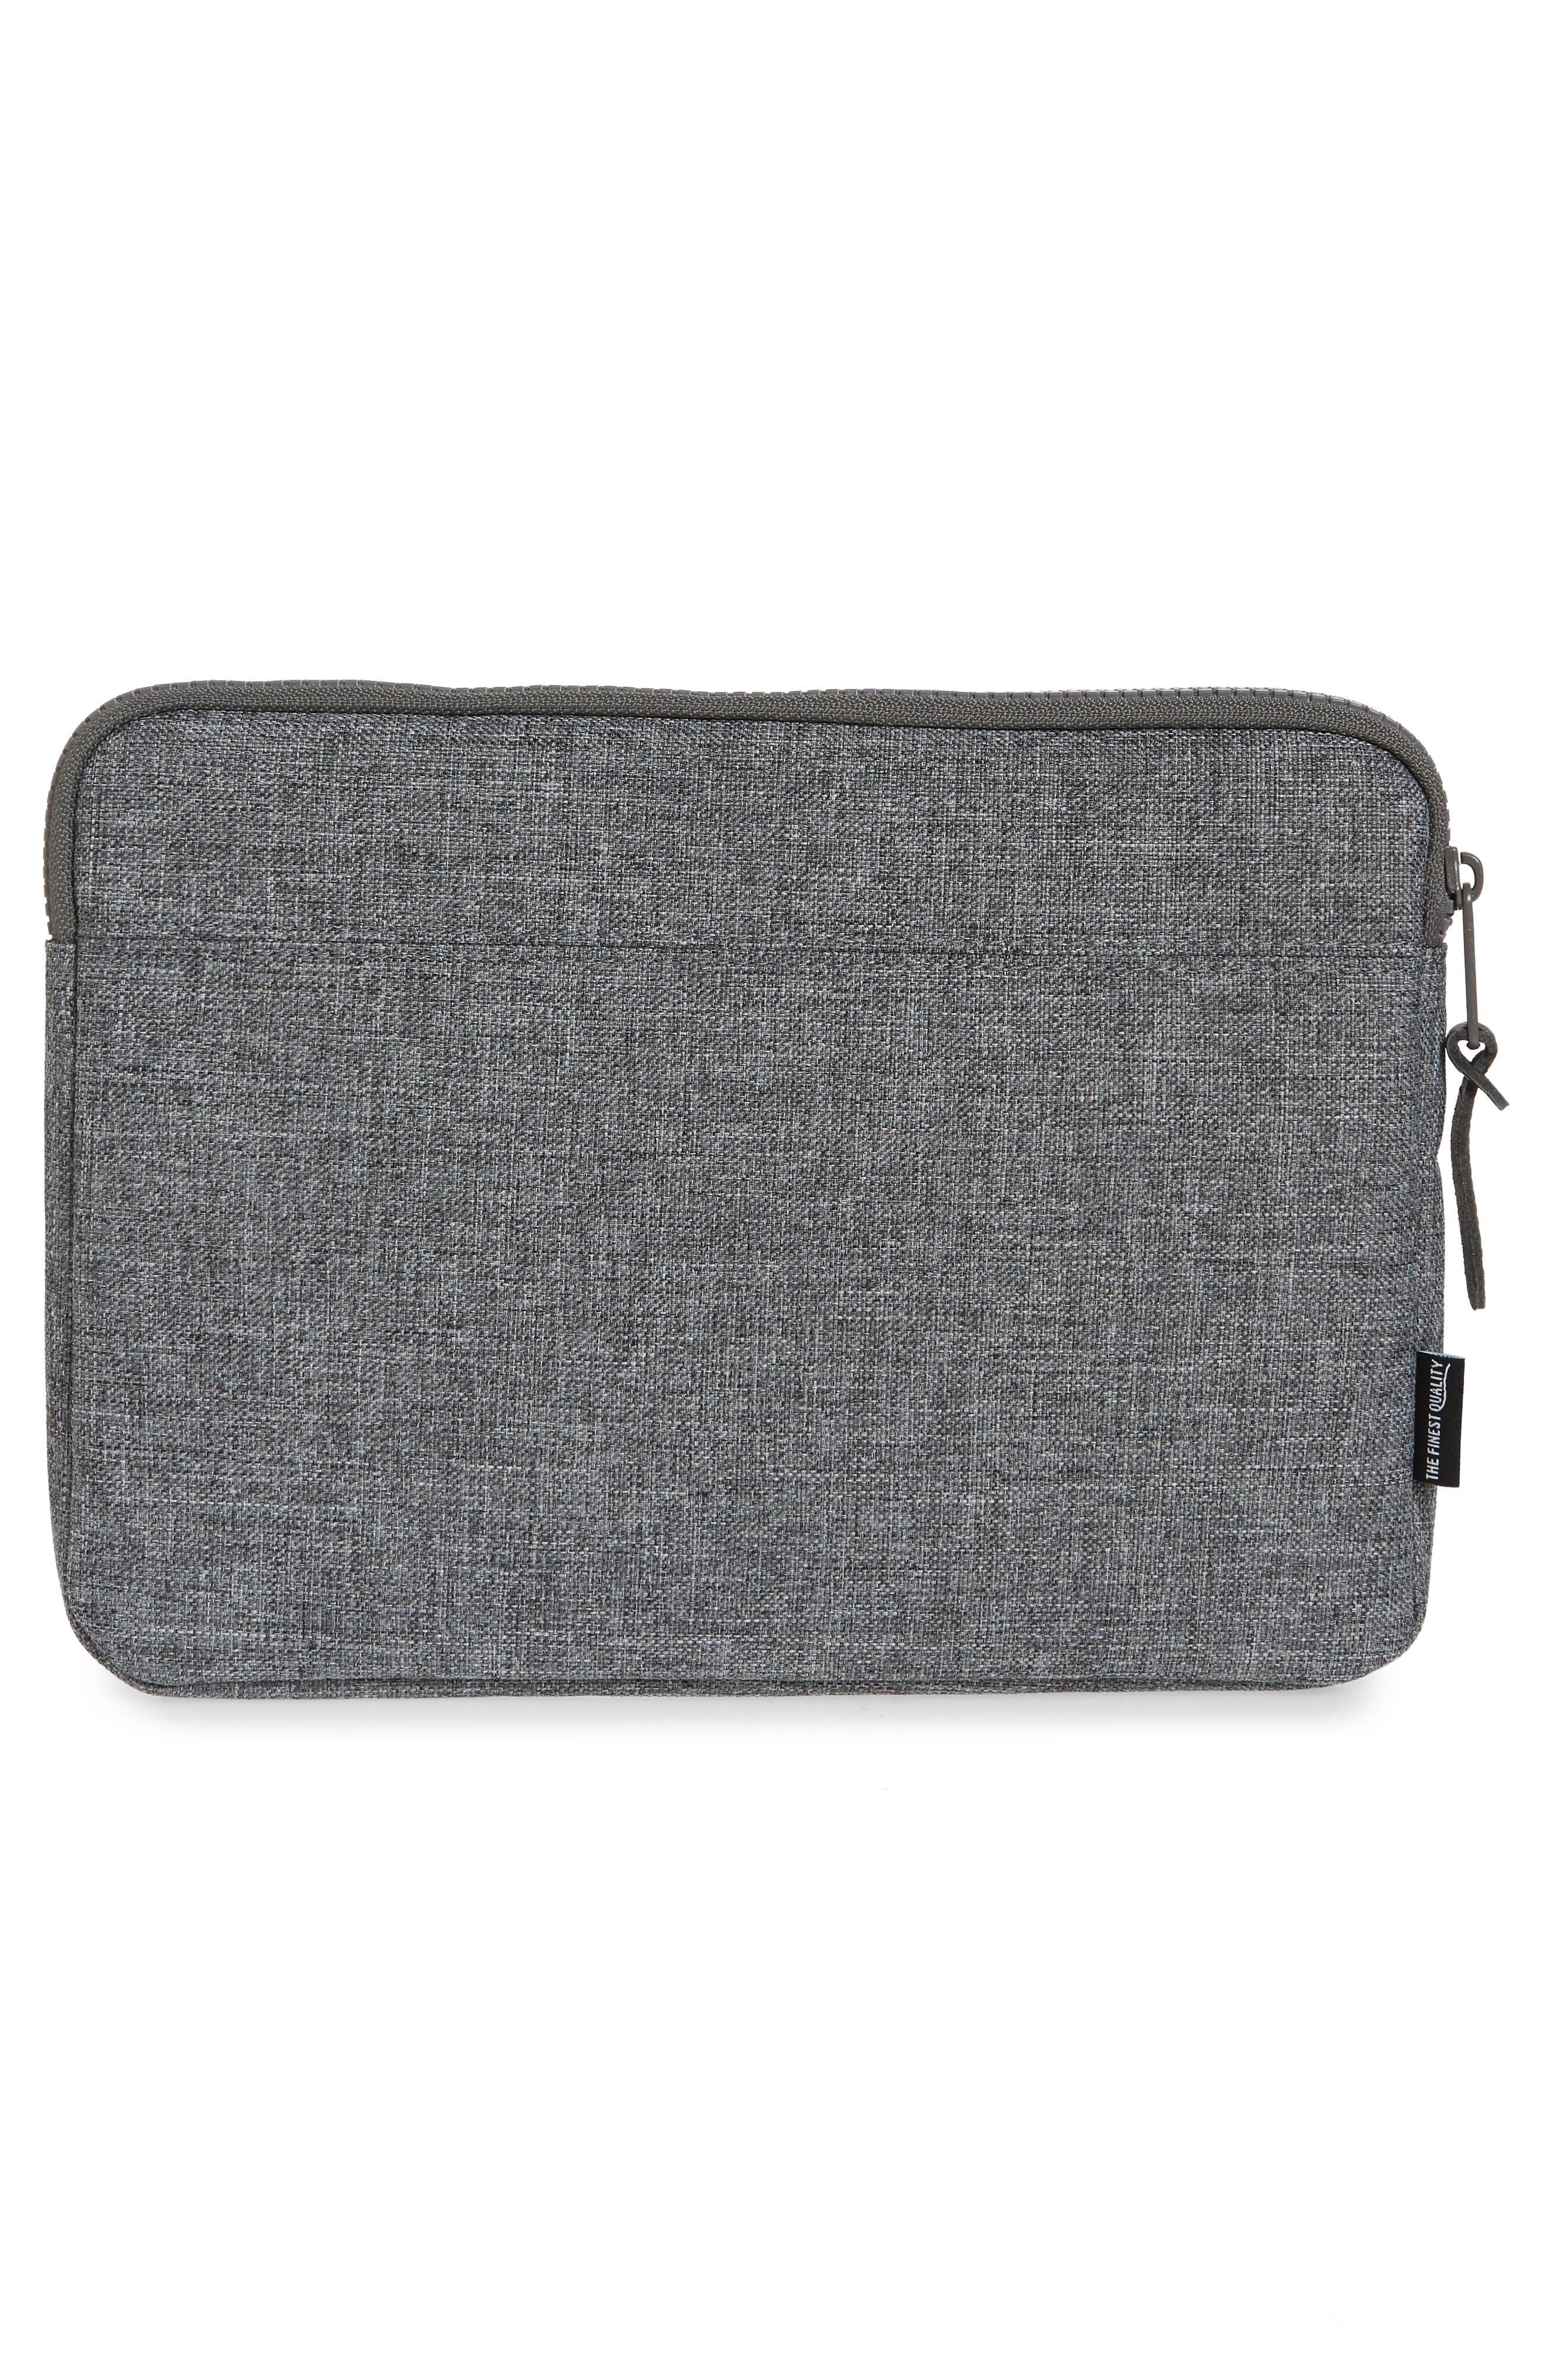 sports shoes 004a2 d21ba Laptop Bags & Cases Accessories | Nordstrom